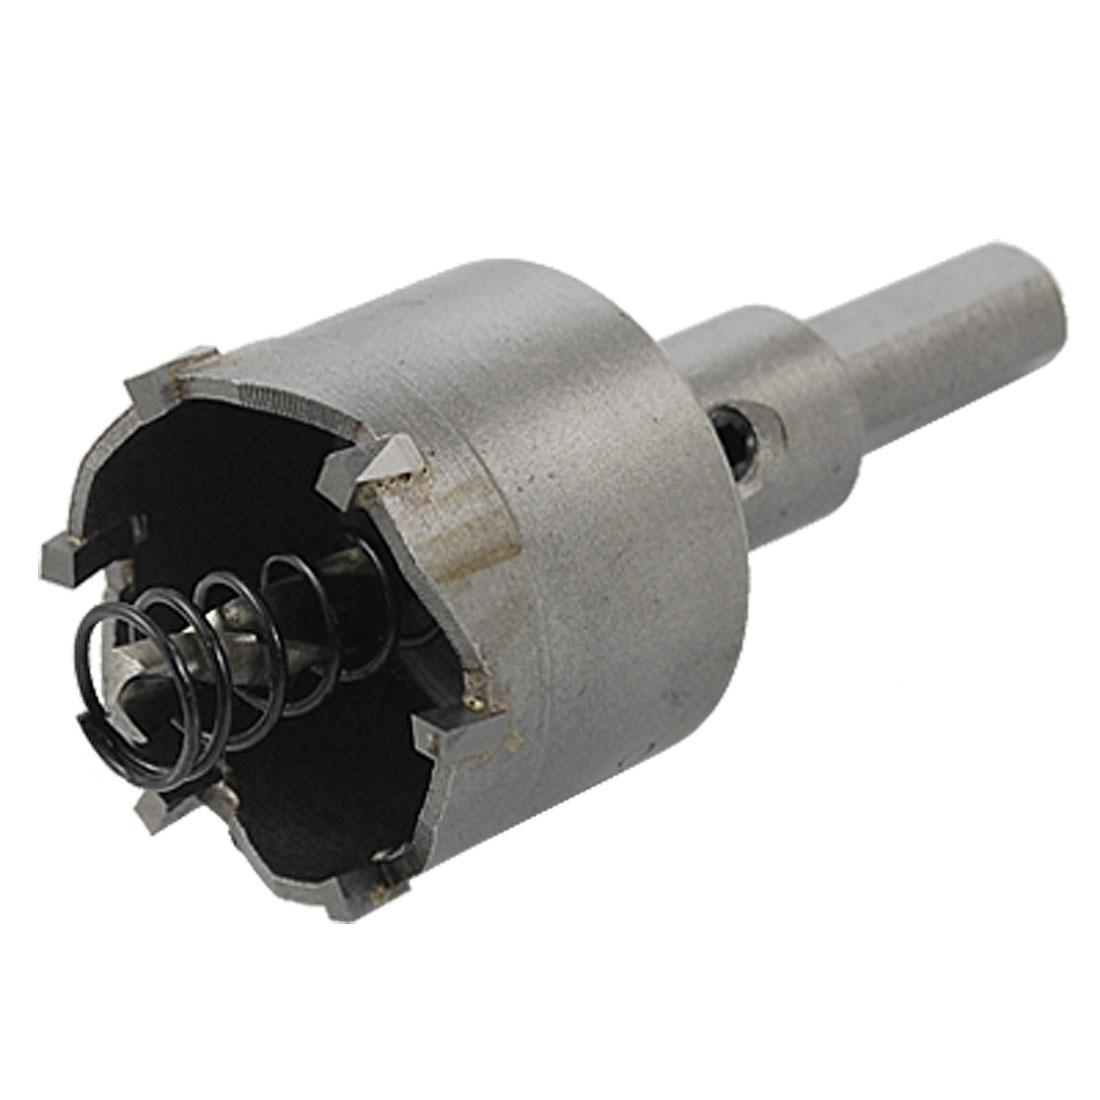 35mm Diameter Twist Drill Bit Inside Hole Saw for Alloy Cutting